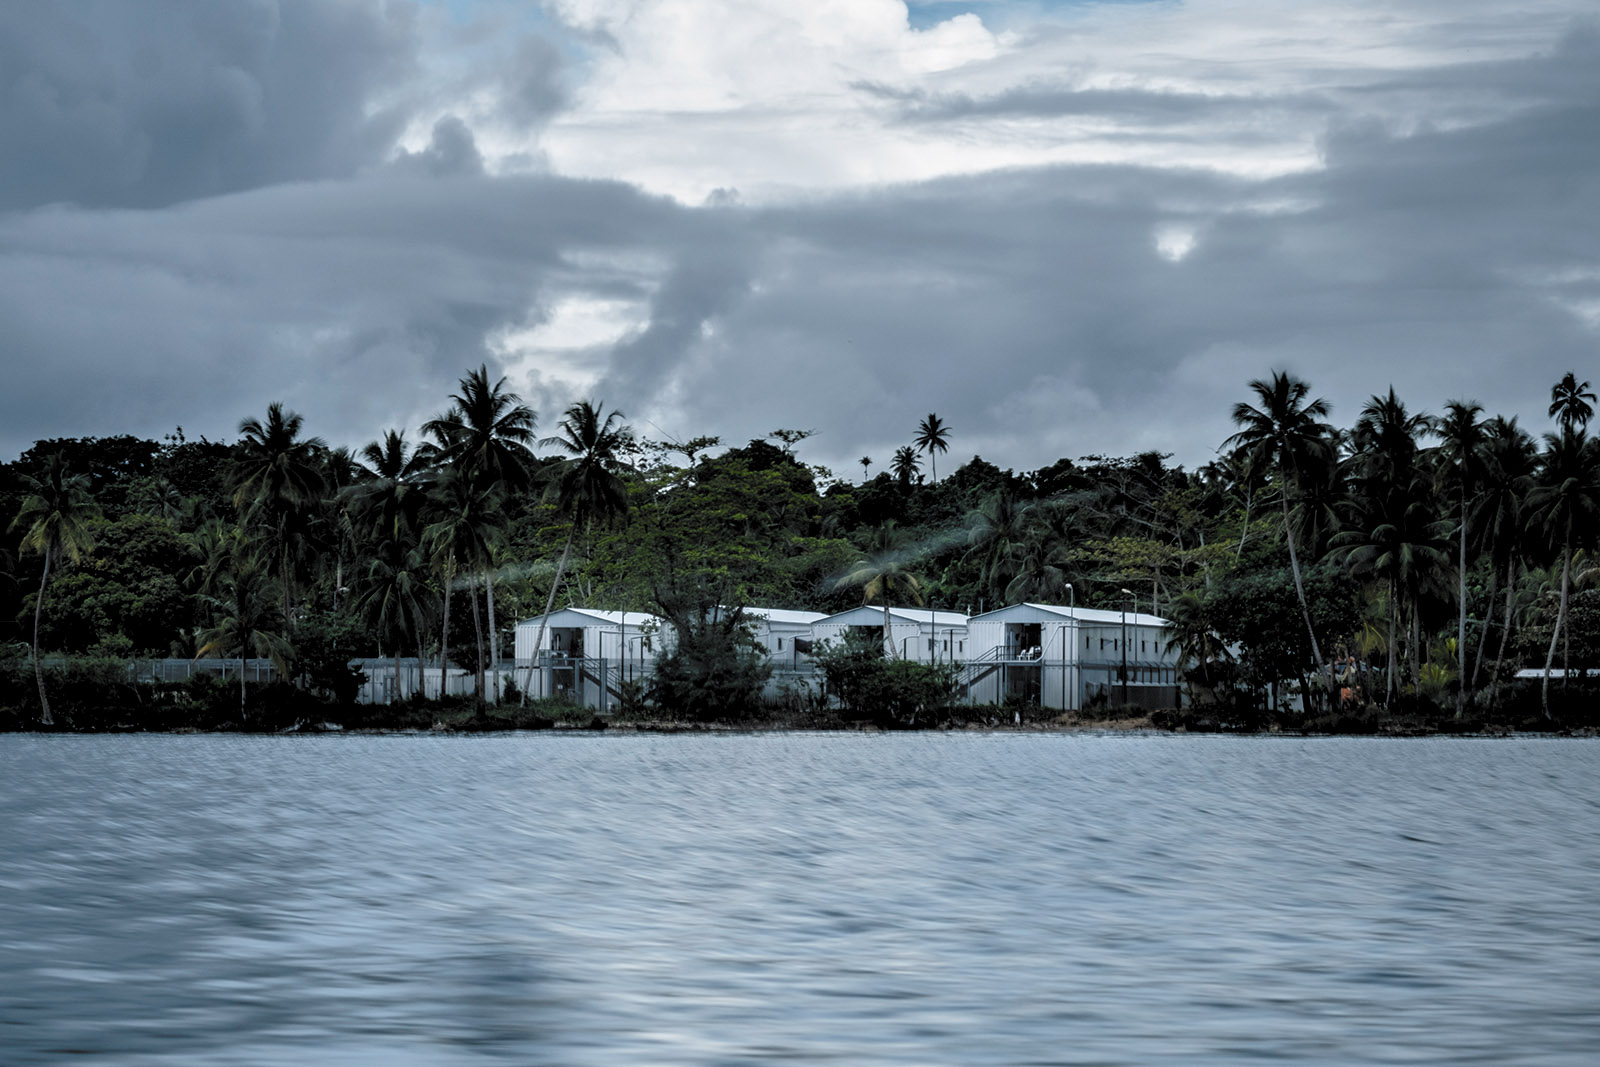 An Australian-run camp where asylum-seekers who try to reach Australia by boat are detained, Manus Island, Papua New Guinea, November 2016